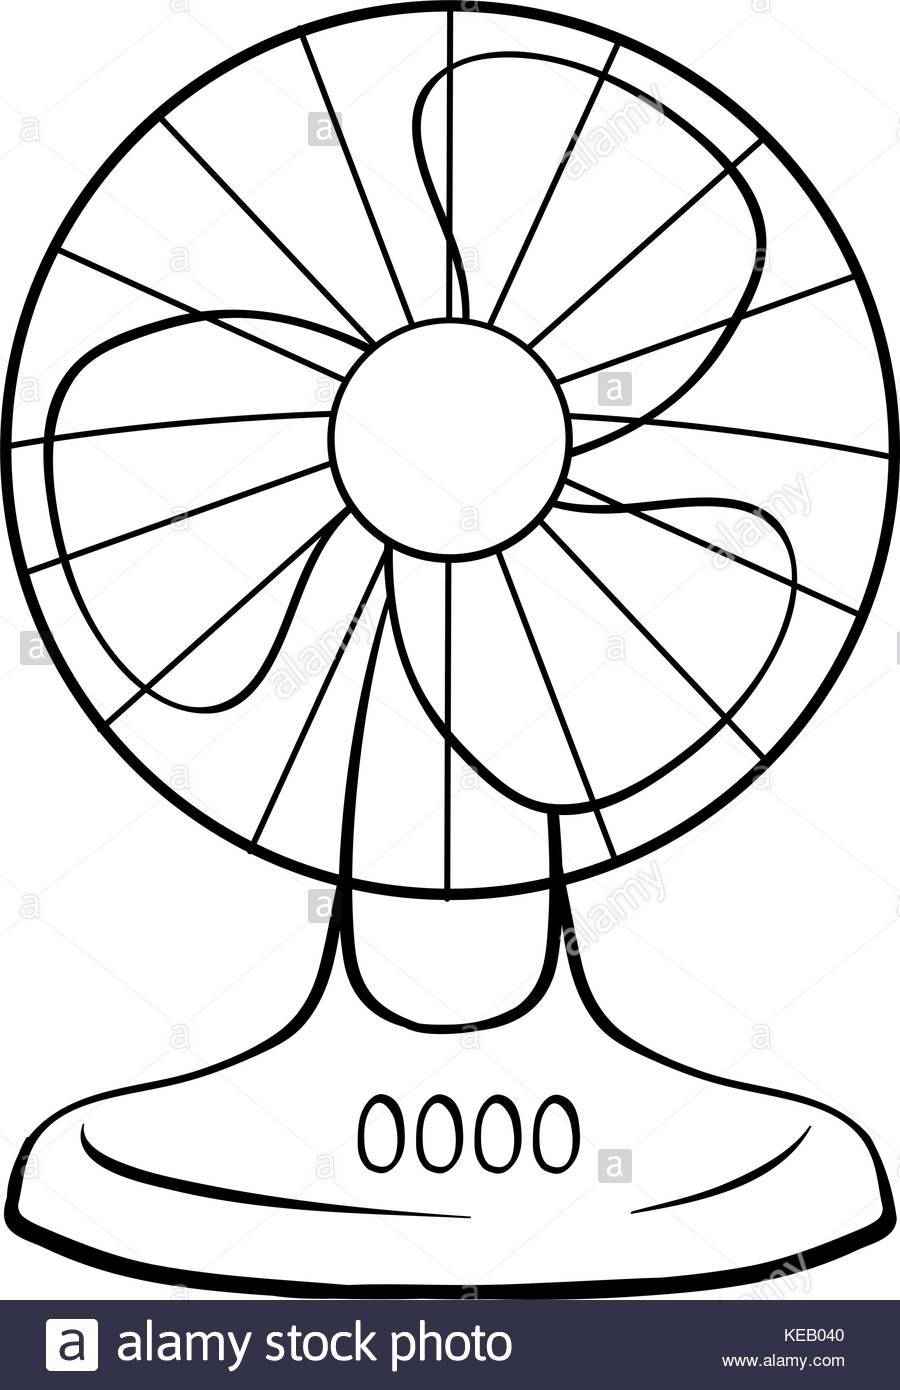 Clipart fan black and white 6 » Clipart Portal.